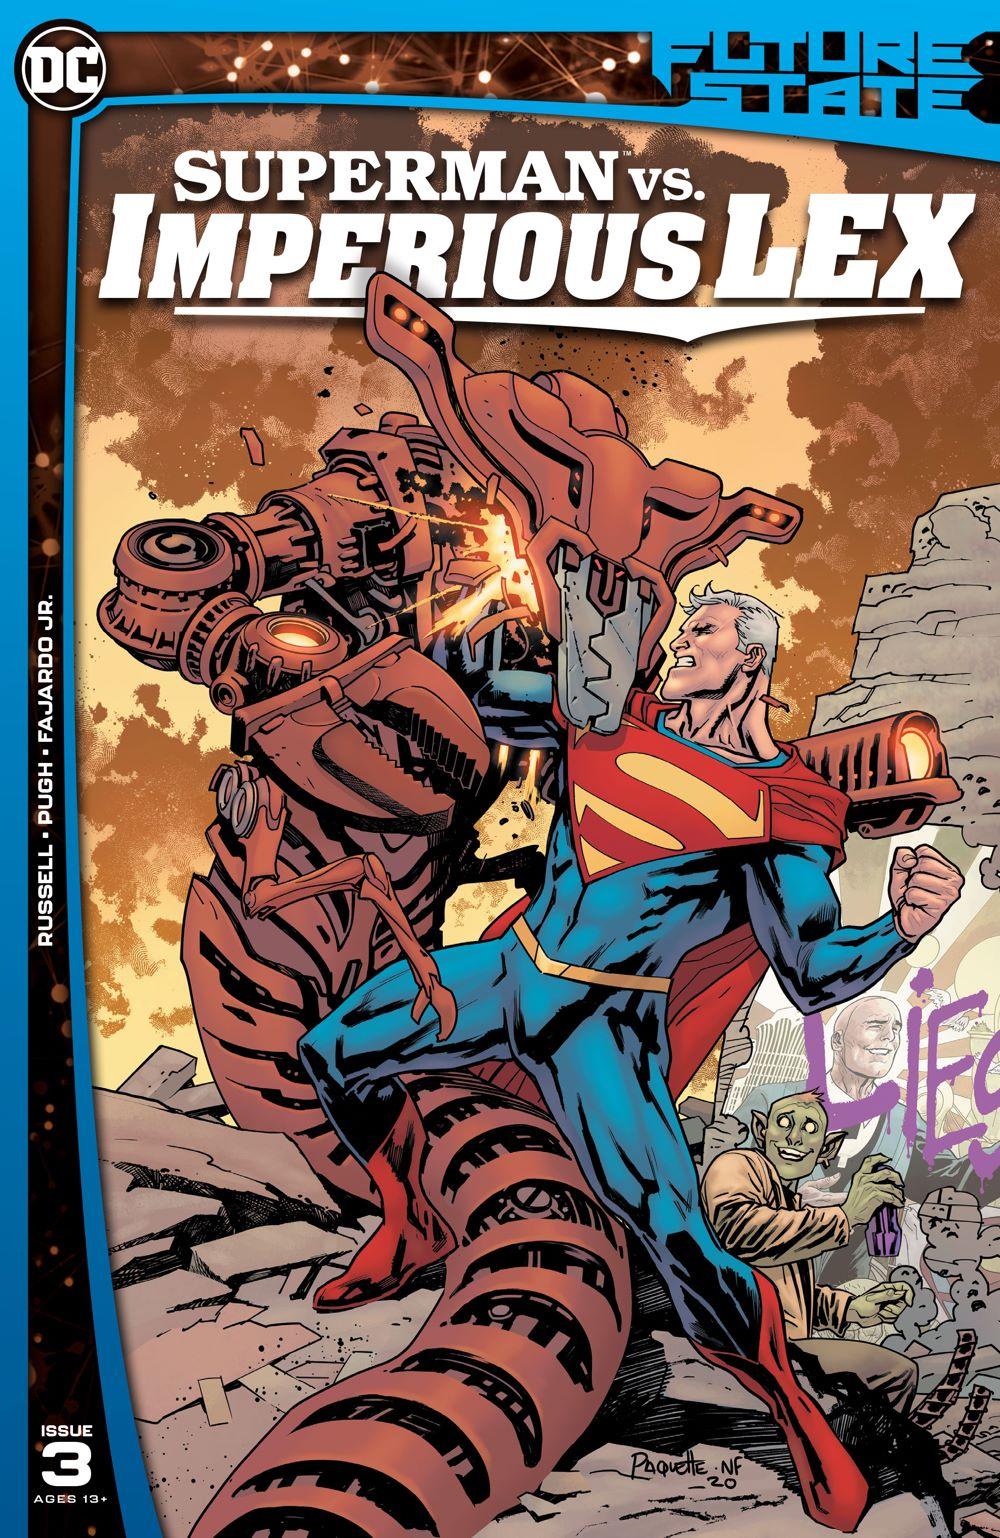 Future-State-Superman-vs-Imperious-Lex-3-1_605d436cd6a7b2.88640353 ComicList Previews: FUTURE STATE SUPERMAN VS IMPERIOUS LEX #3 (OF 3)